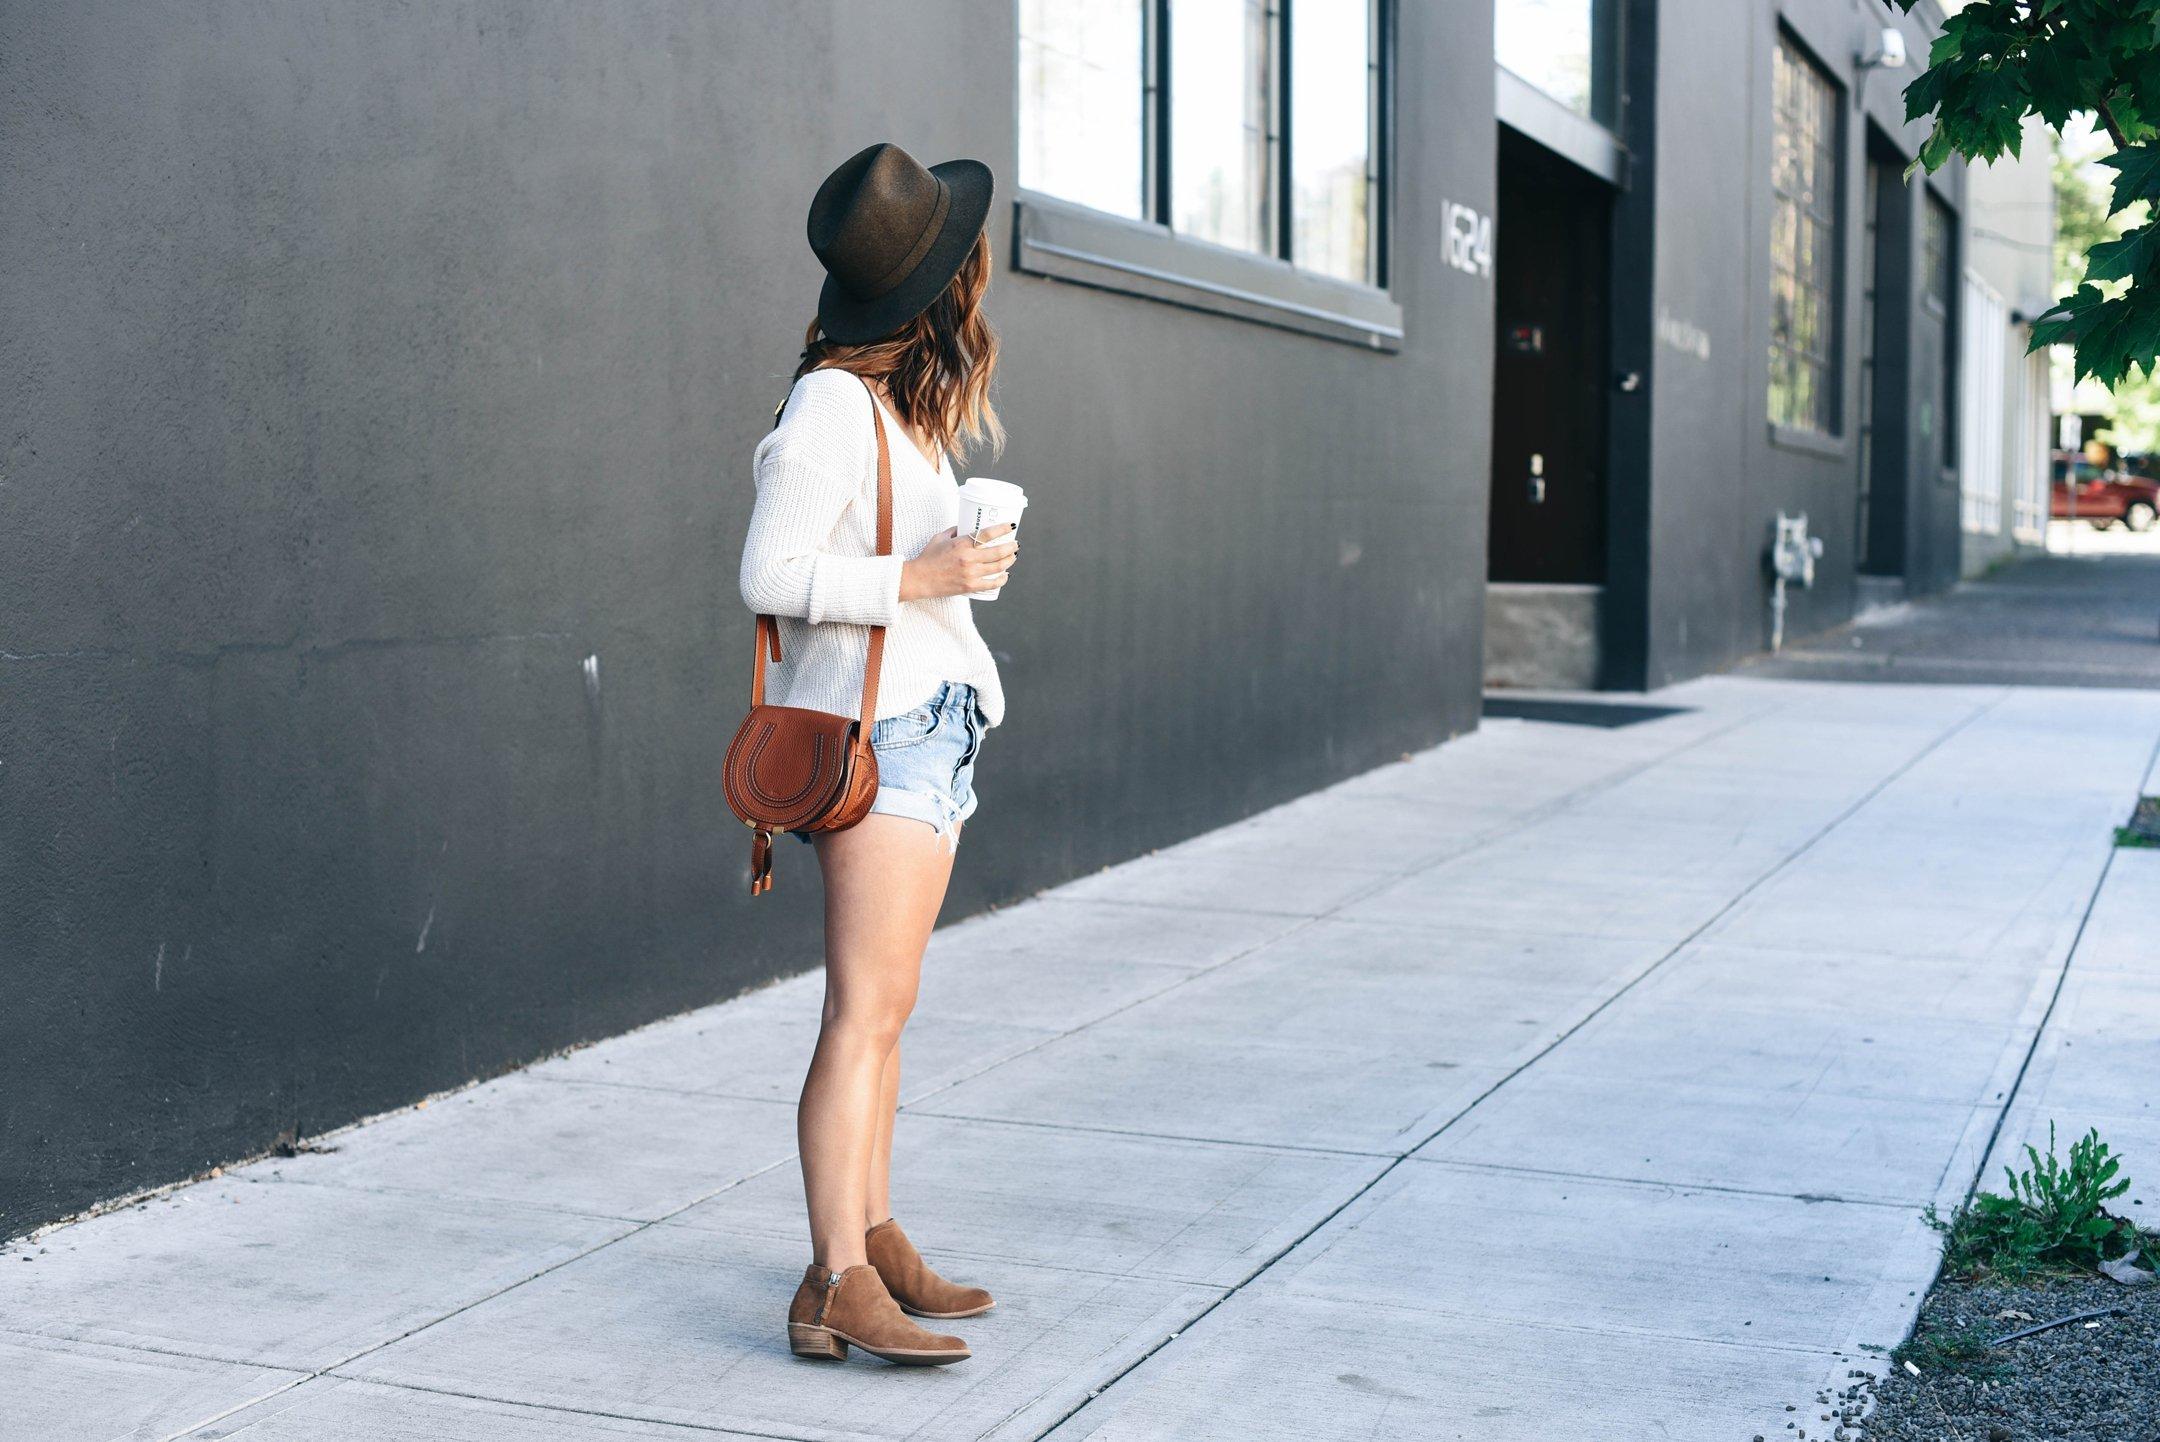 crystalin-marie-wearing-chloe-marcie-small-bag